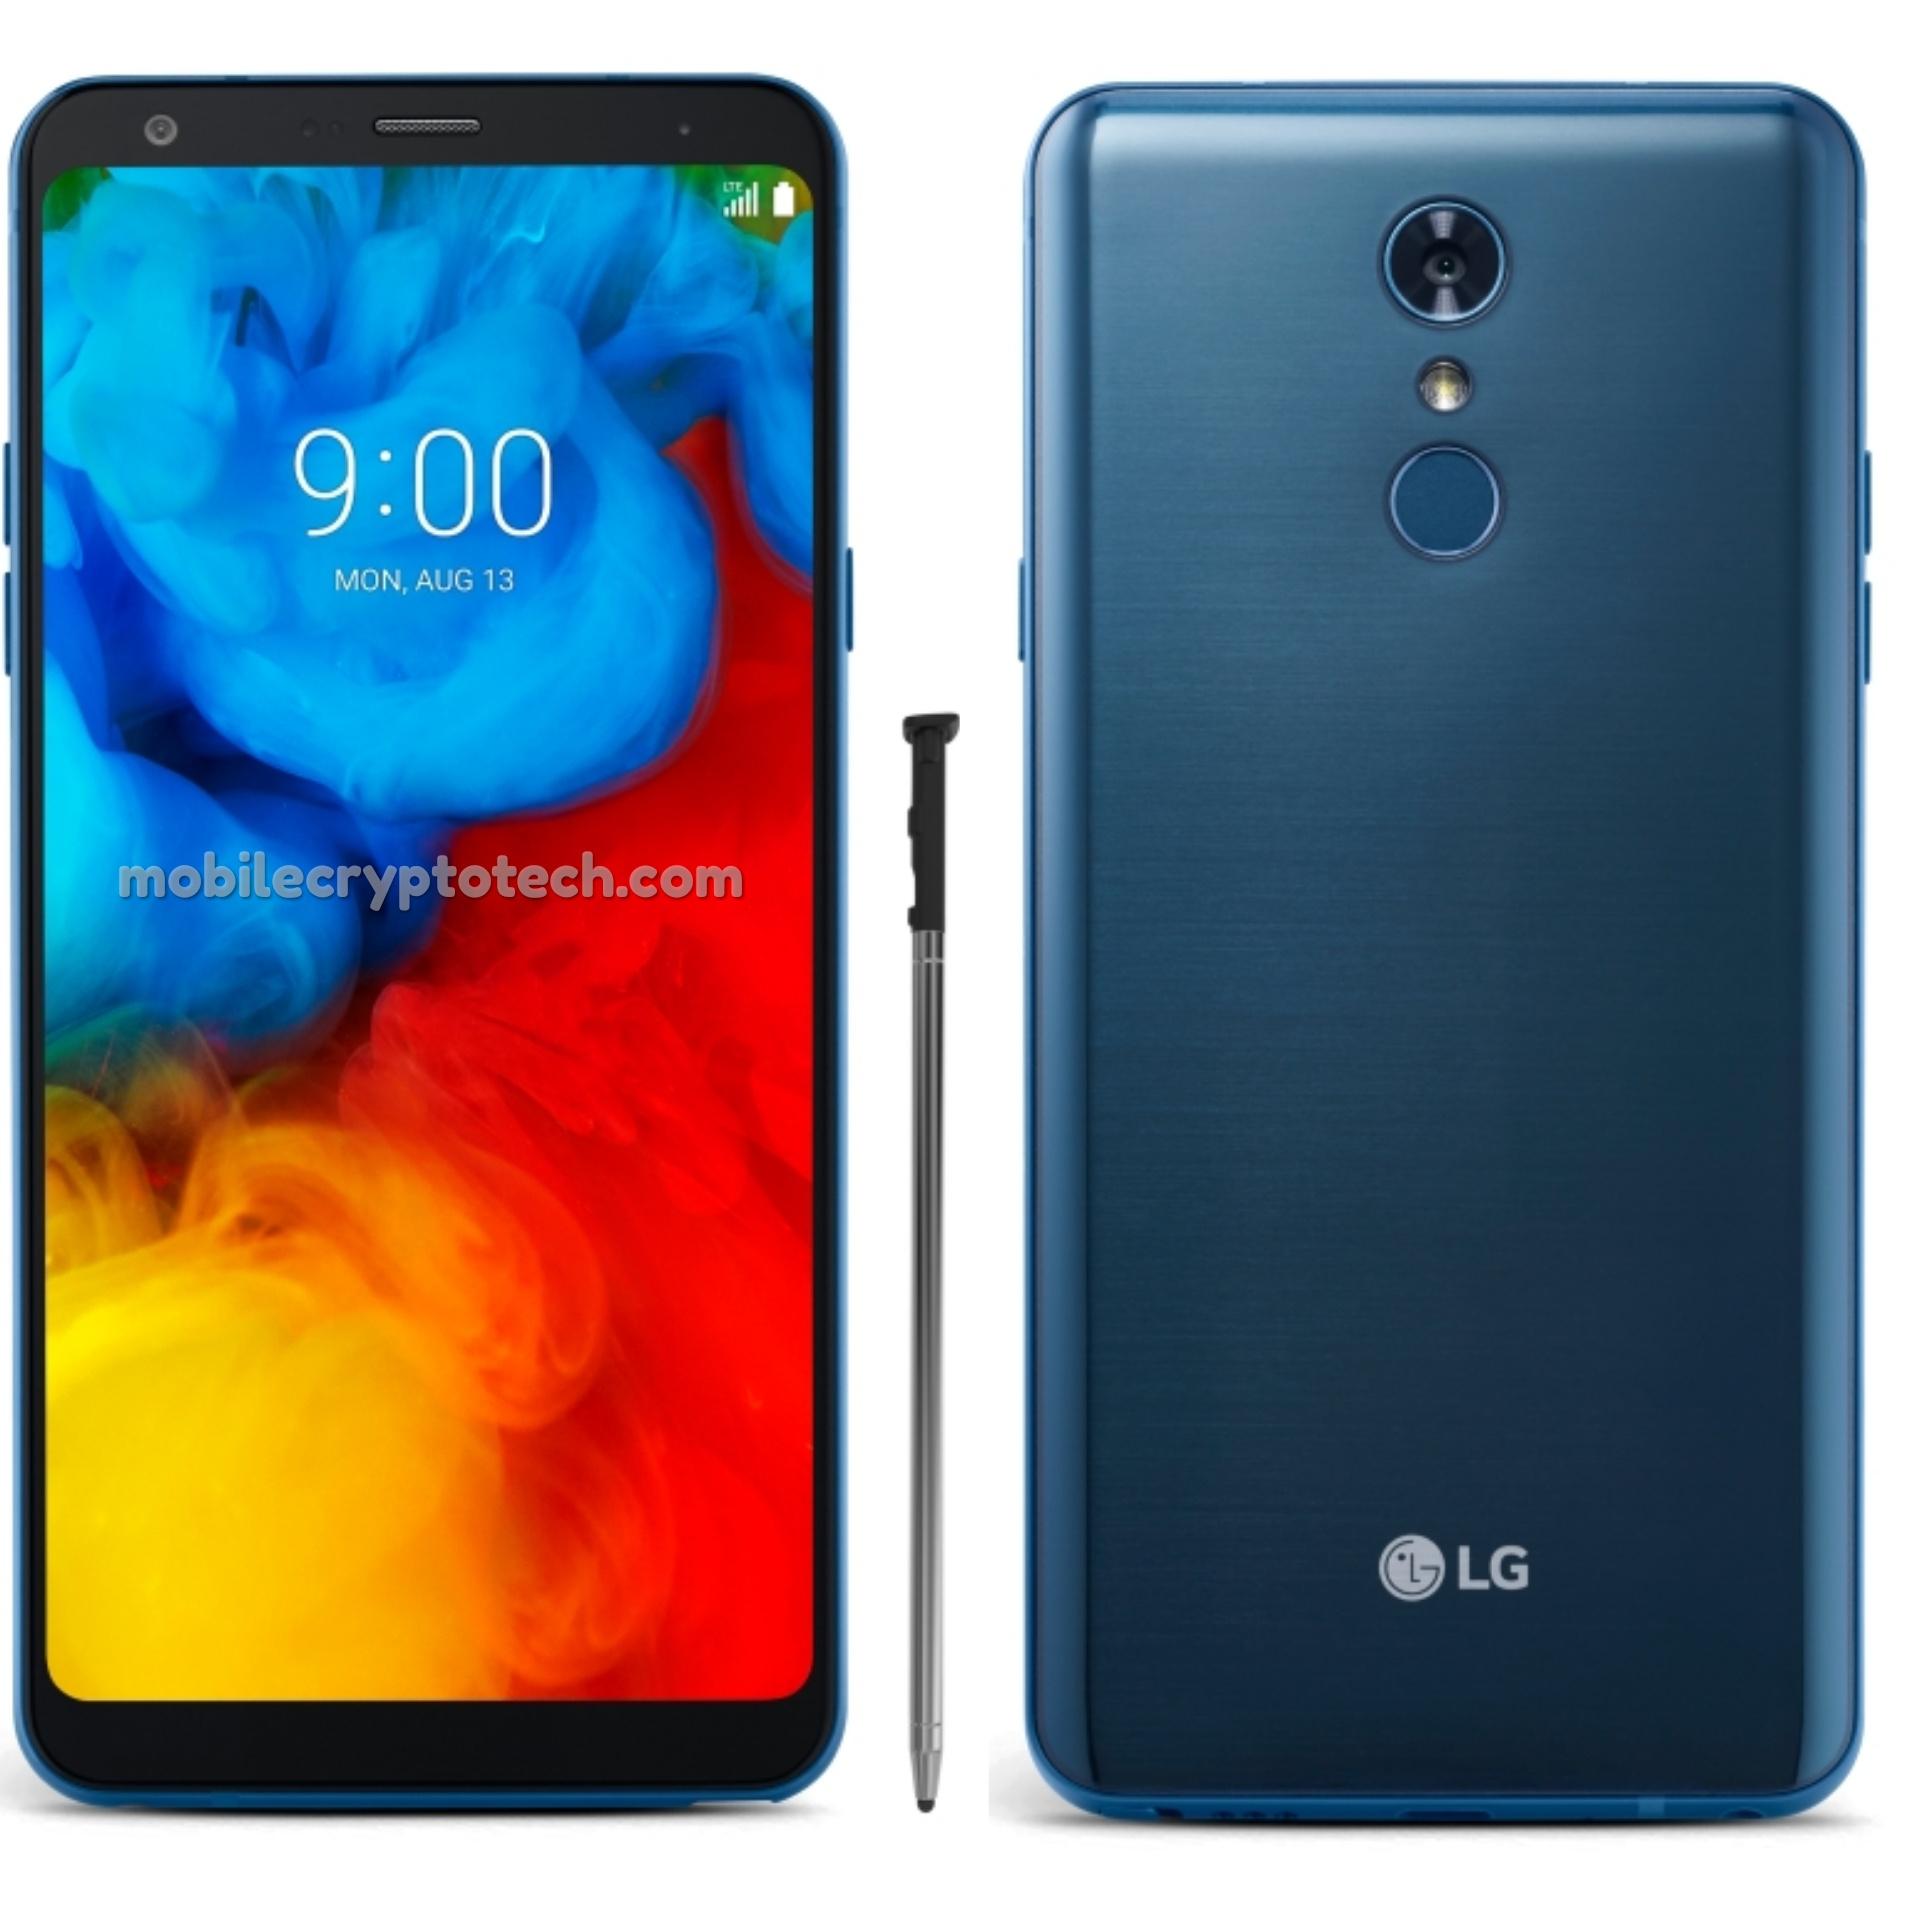 LG Stylo 4 Plus